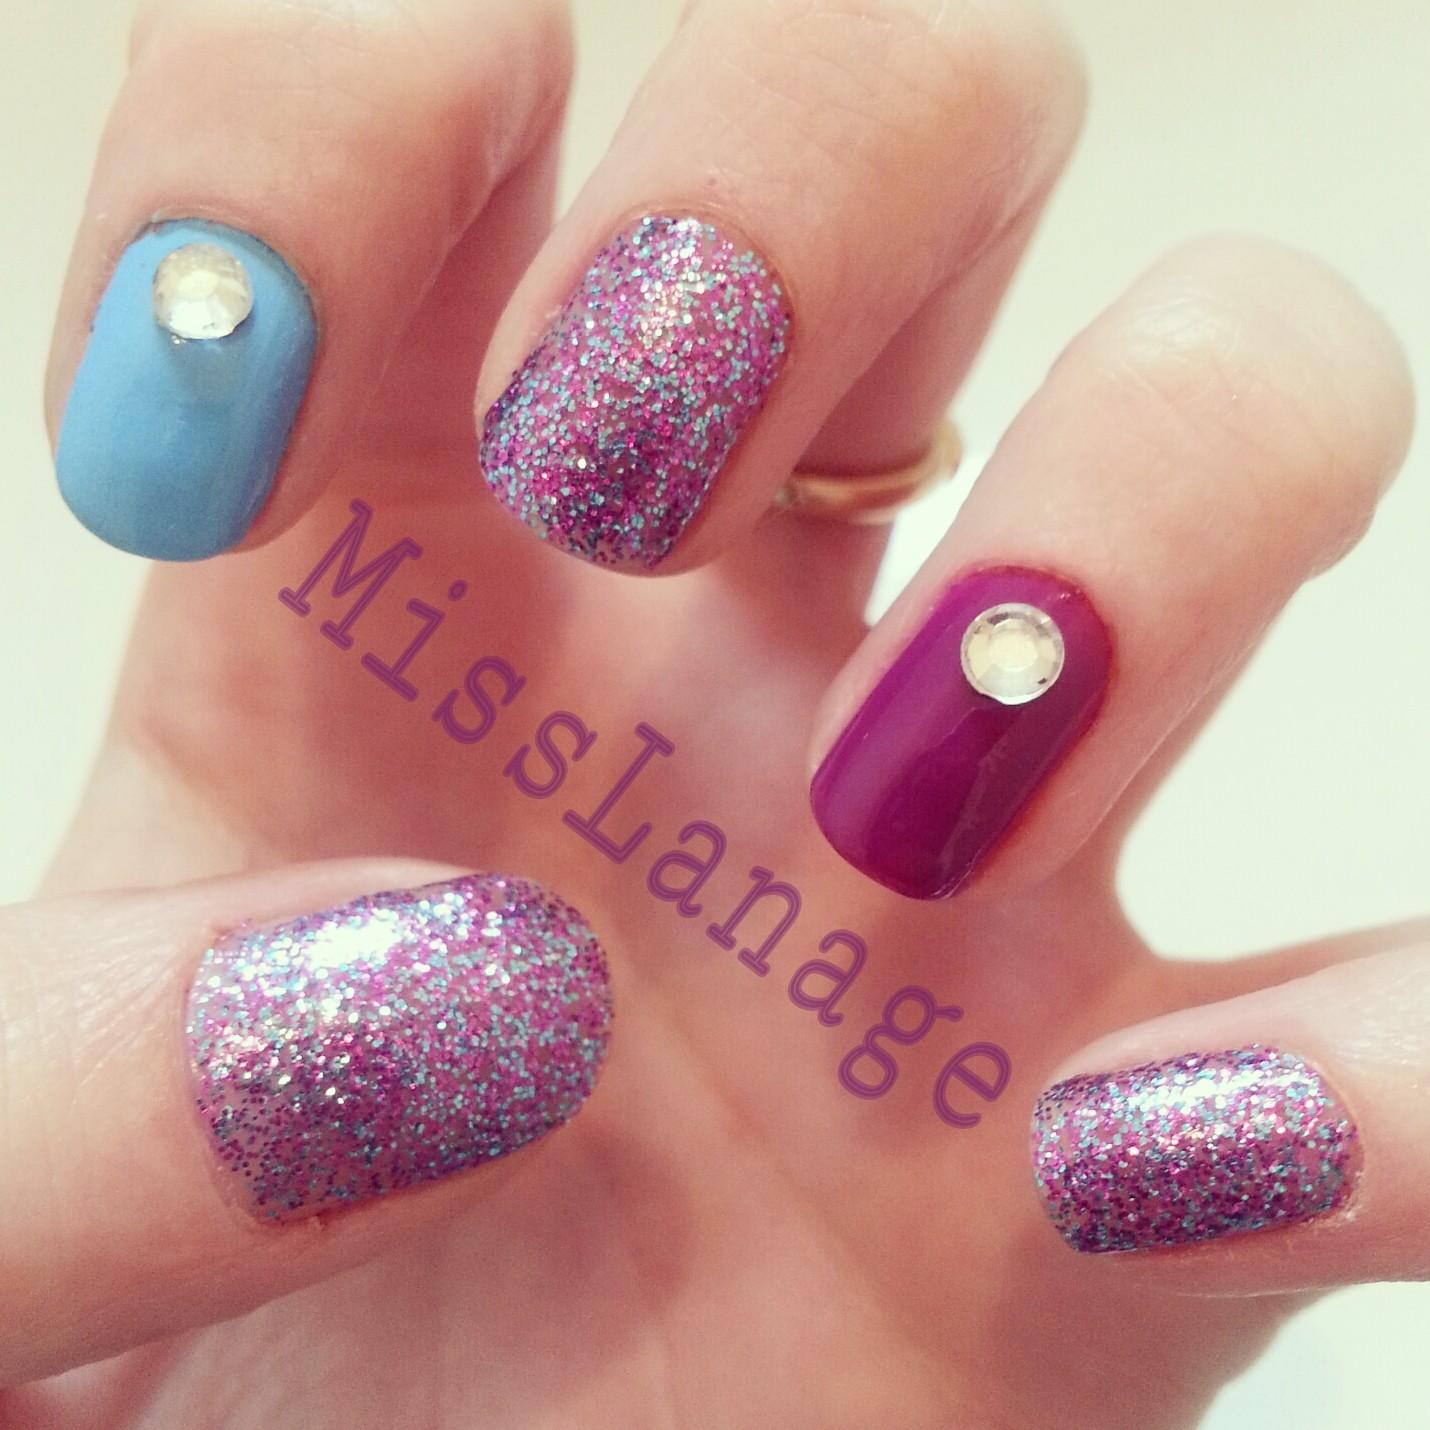 Glitter Nail Art Designs: Nail Designs With Rhinestones